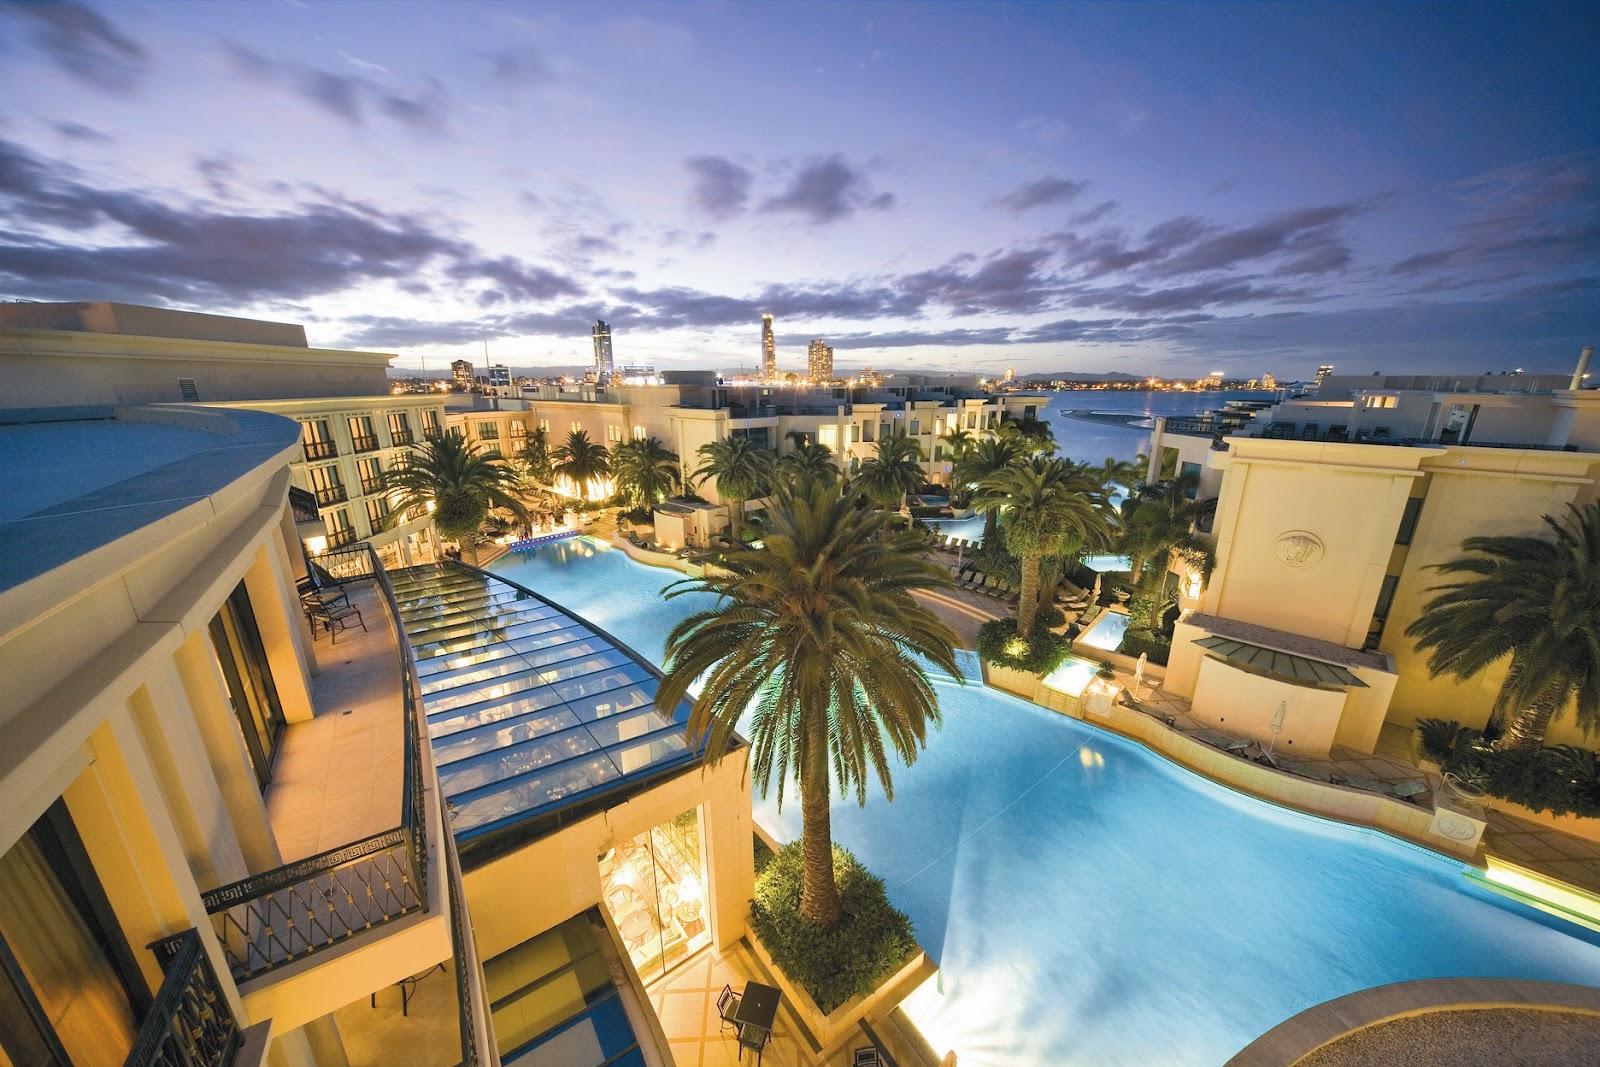 sunlover holidays top 10 gold coast hotels for swimming. Black Bedroom Furniture Sets. Home Design Ideas